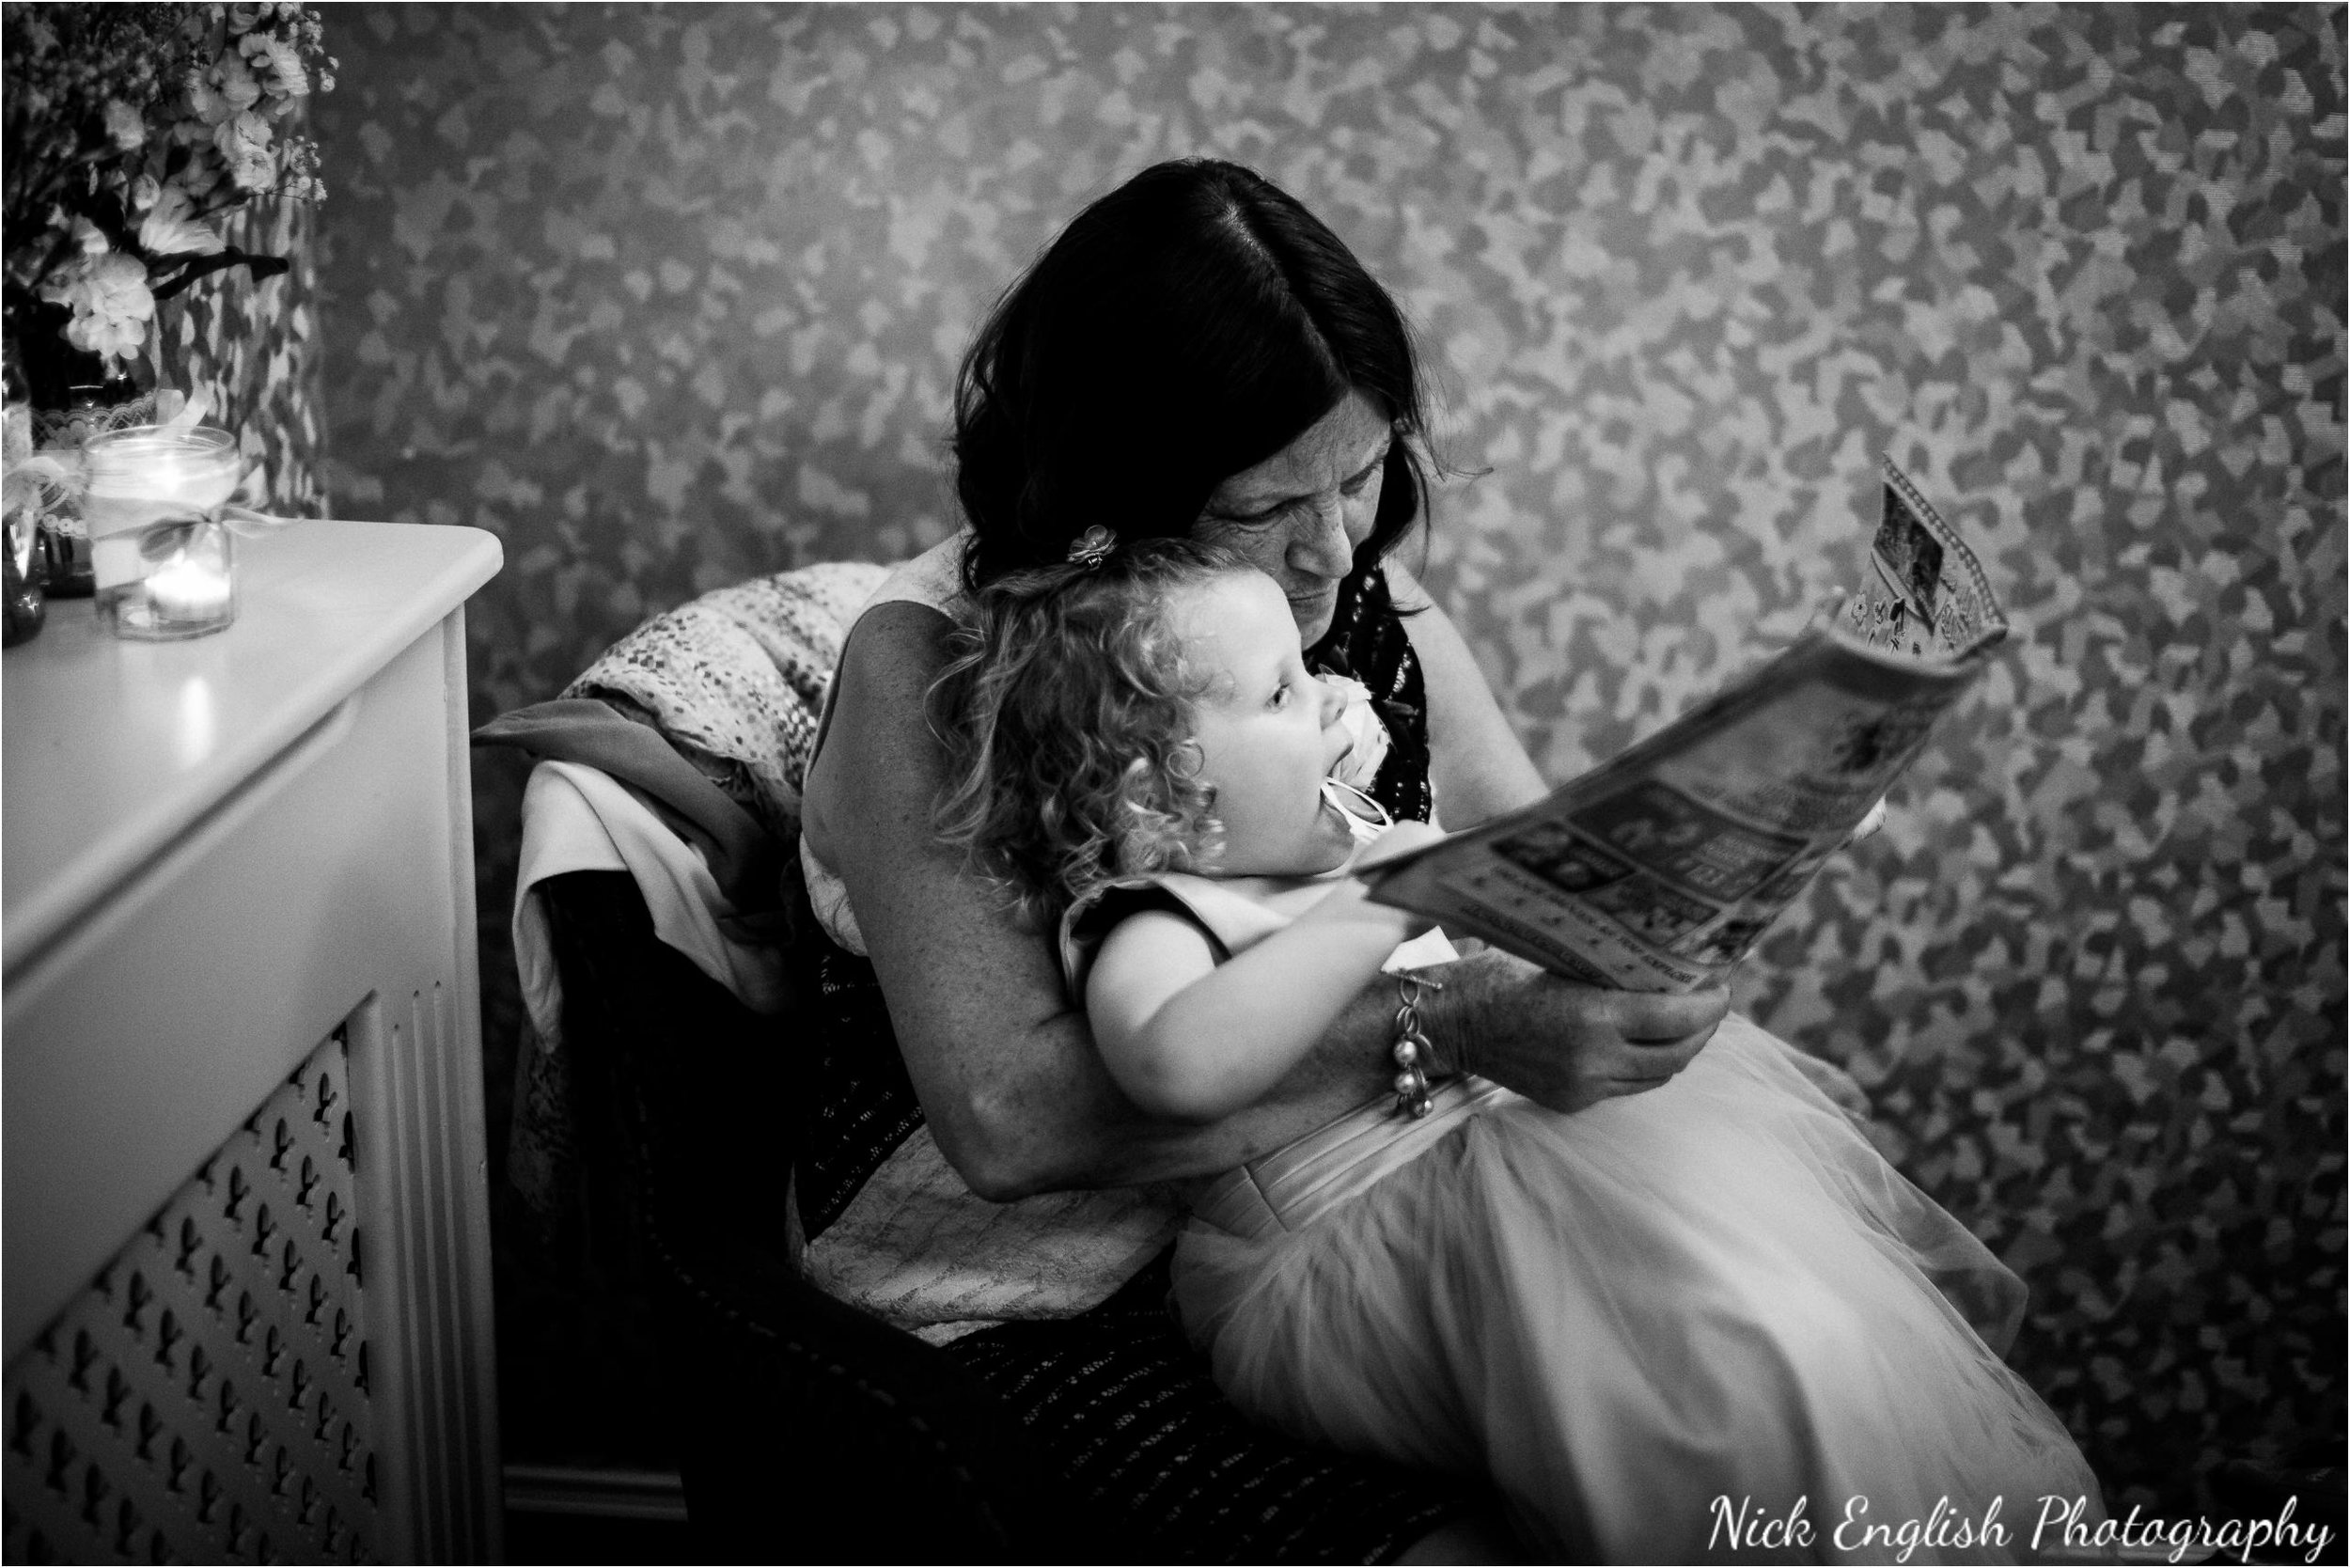 Emily David Wedding Photographs at Barton Grange Preston by Nick English Photography 208jpg.jpeg